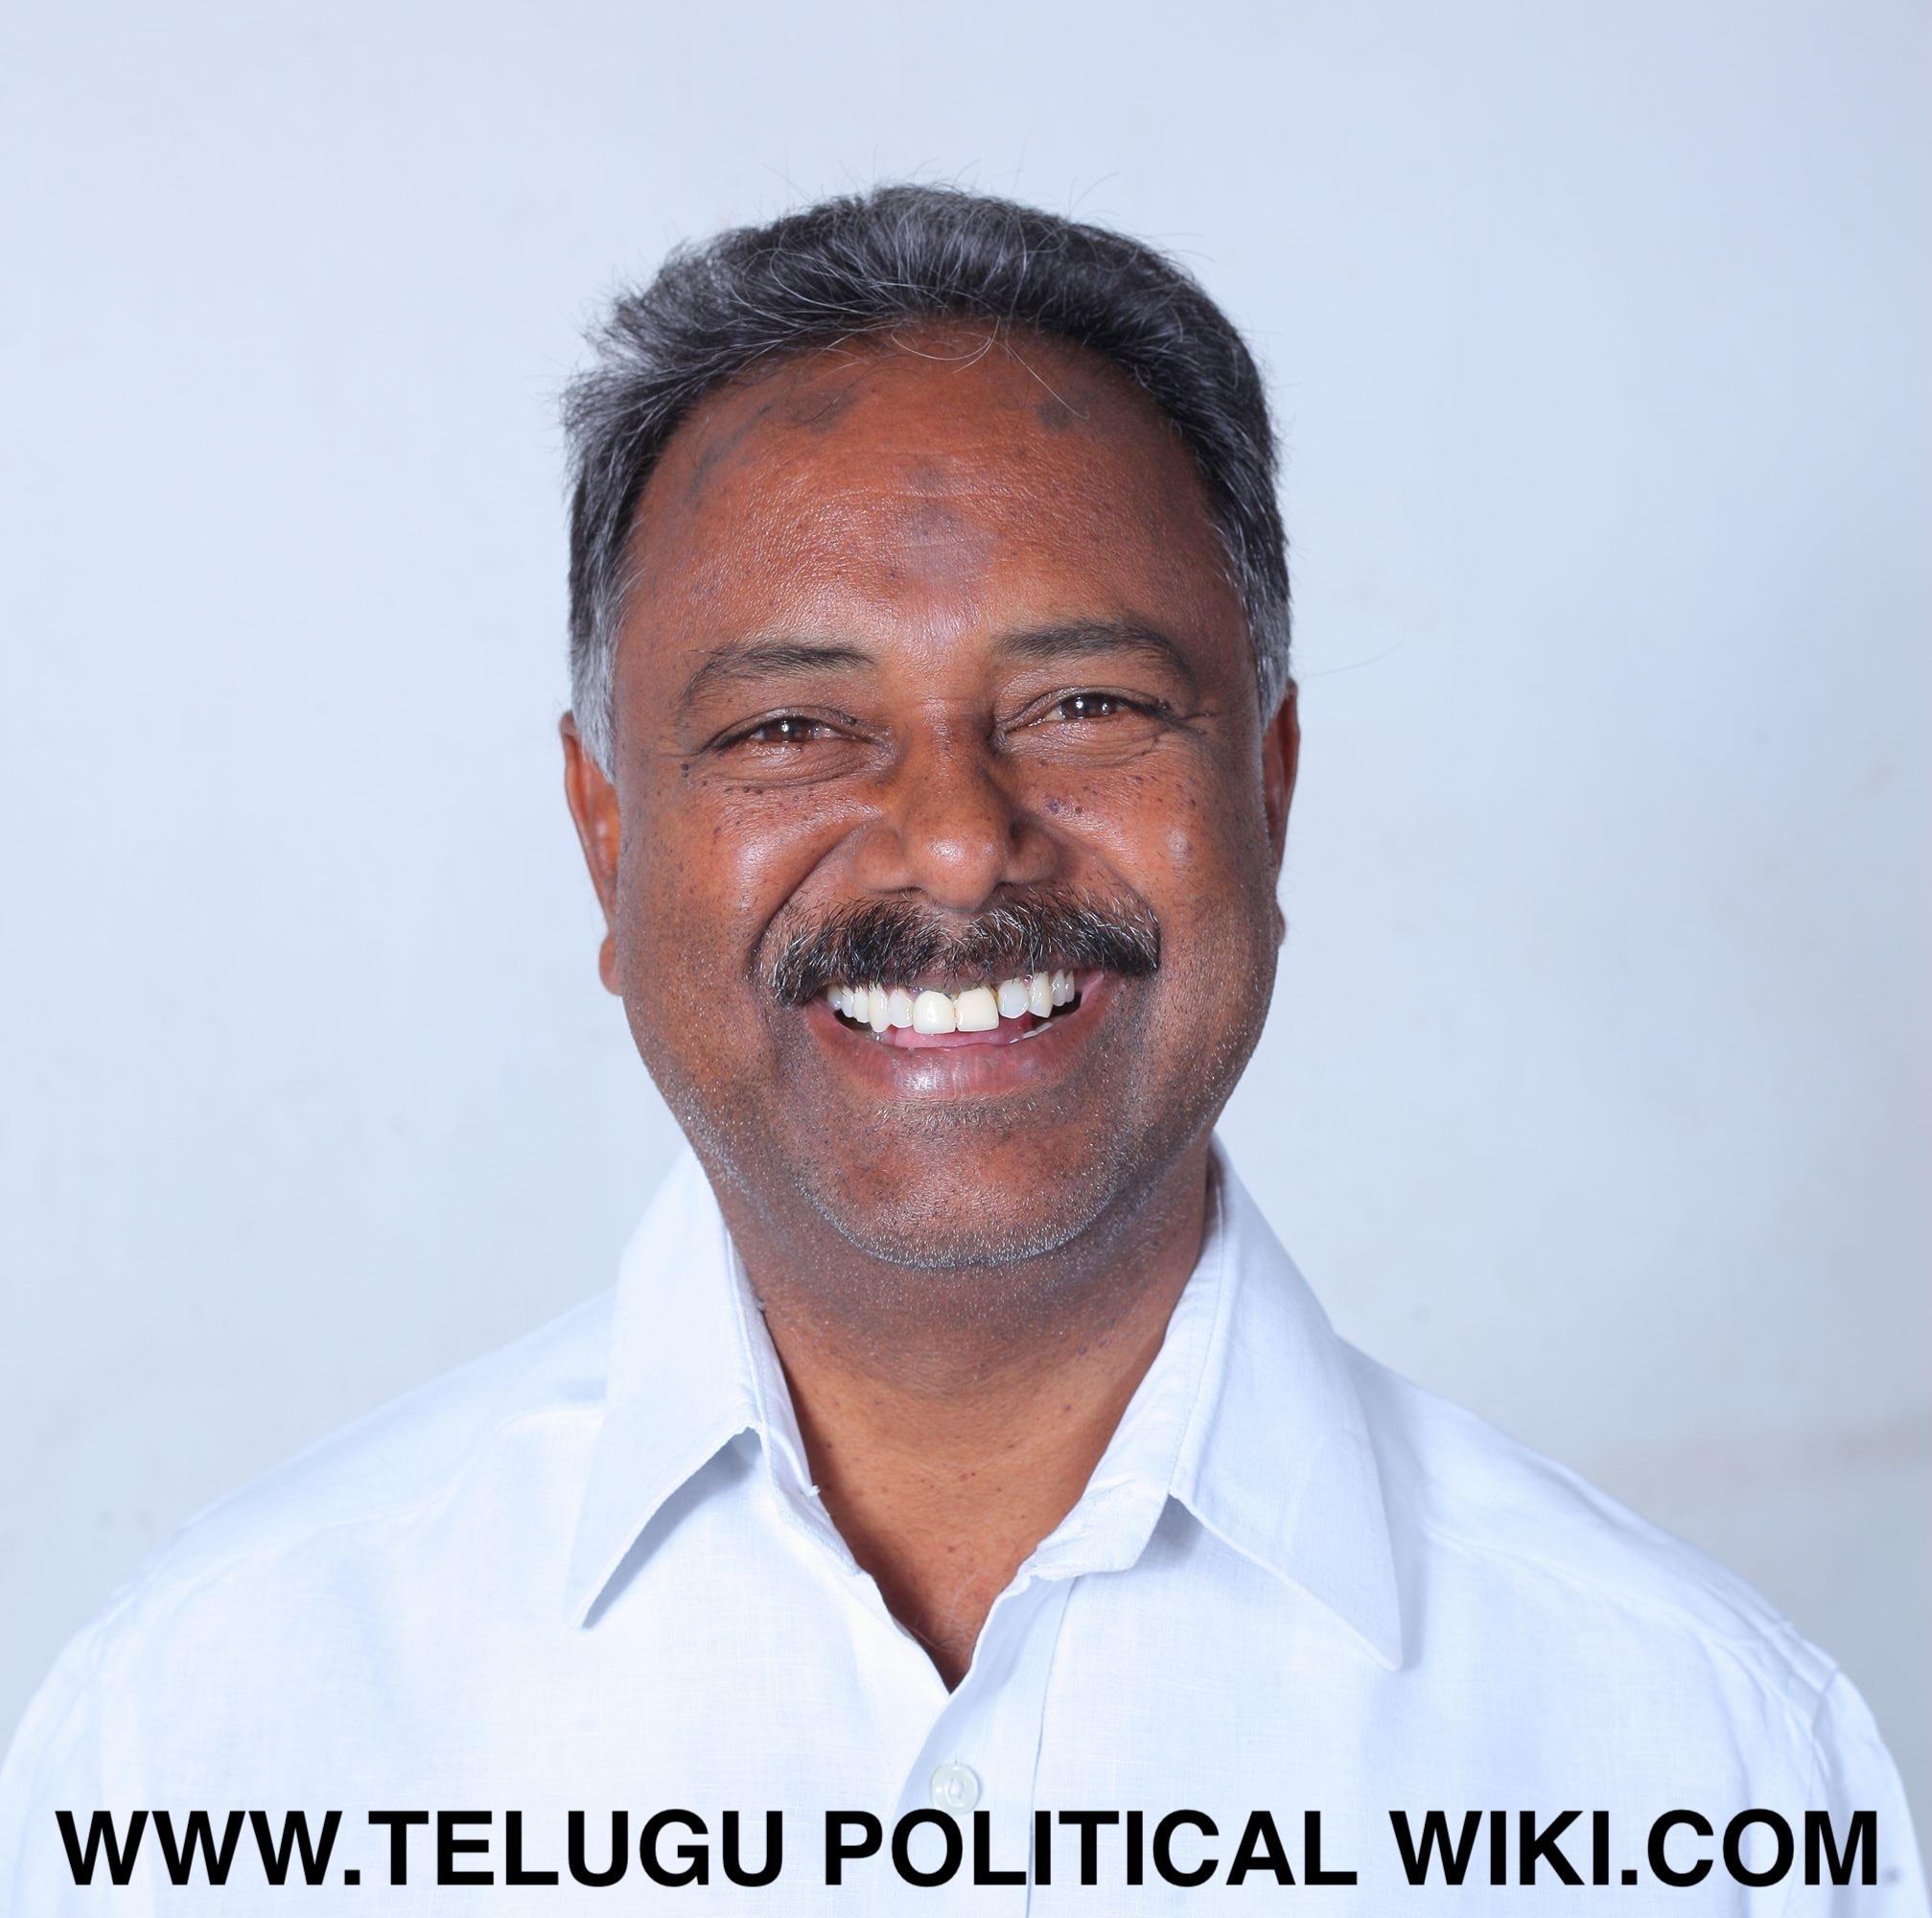 Gandra Satyanarayana Rao